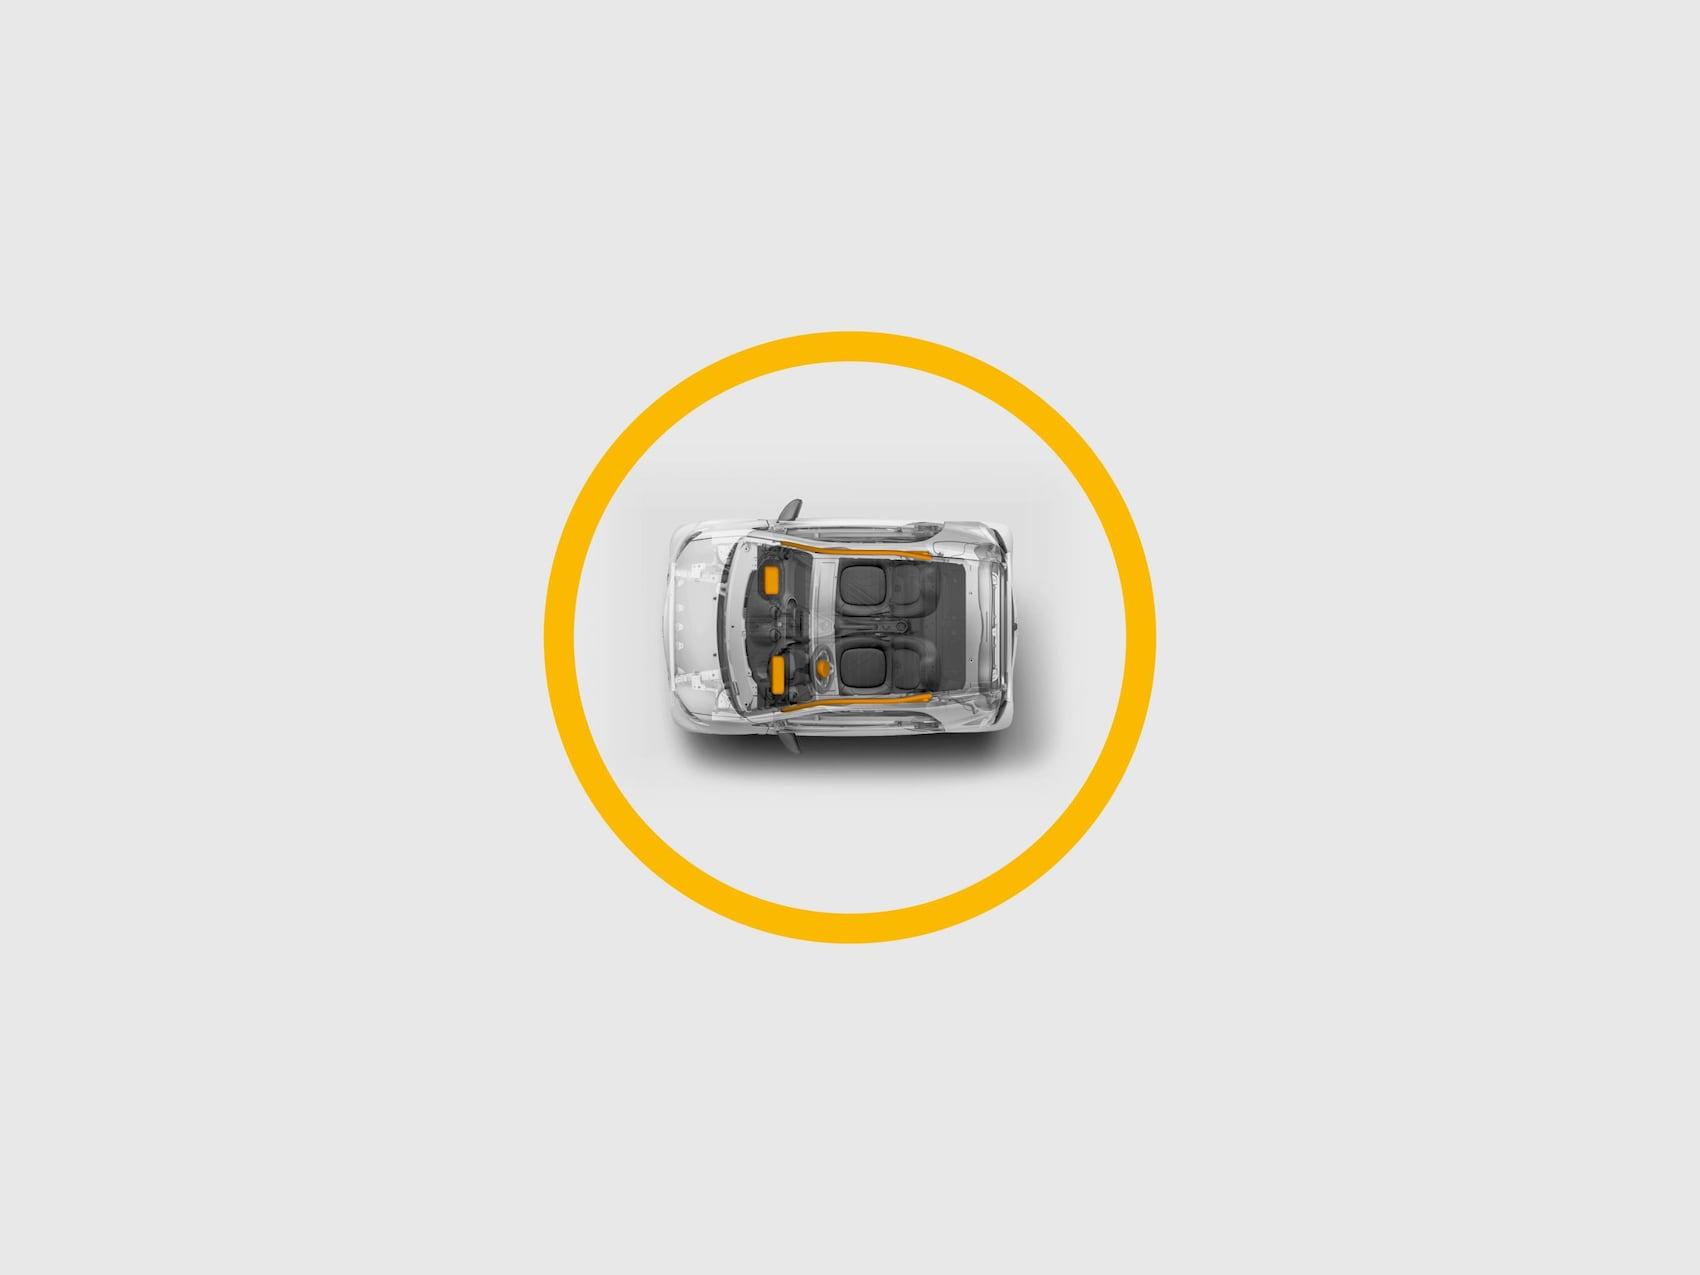 Icône montrant l'airbag.